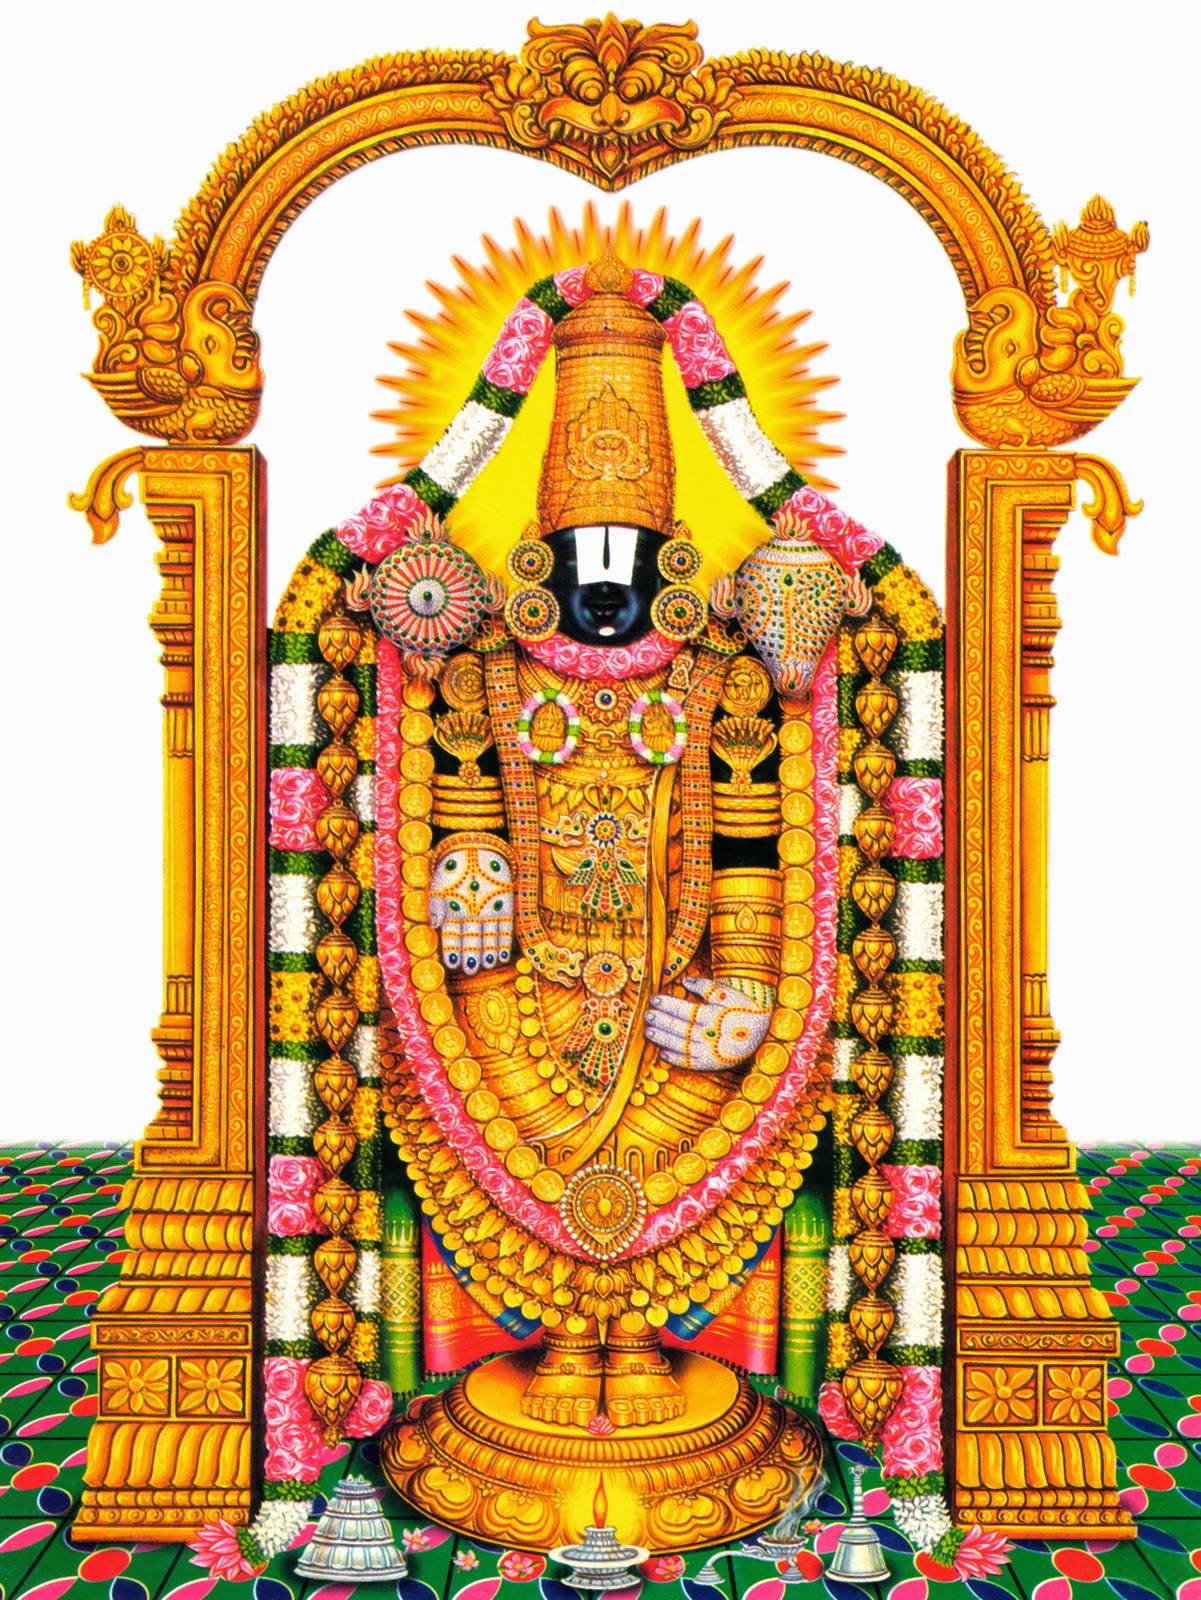 Indian Hindu God Lord Tirupati Venkatachalapathy Venkateswara Image High Resolution Desktop Wallpaper Murugan Painting